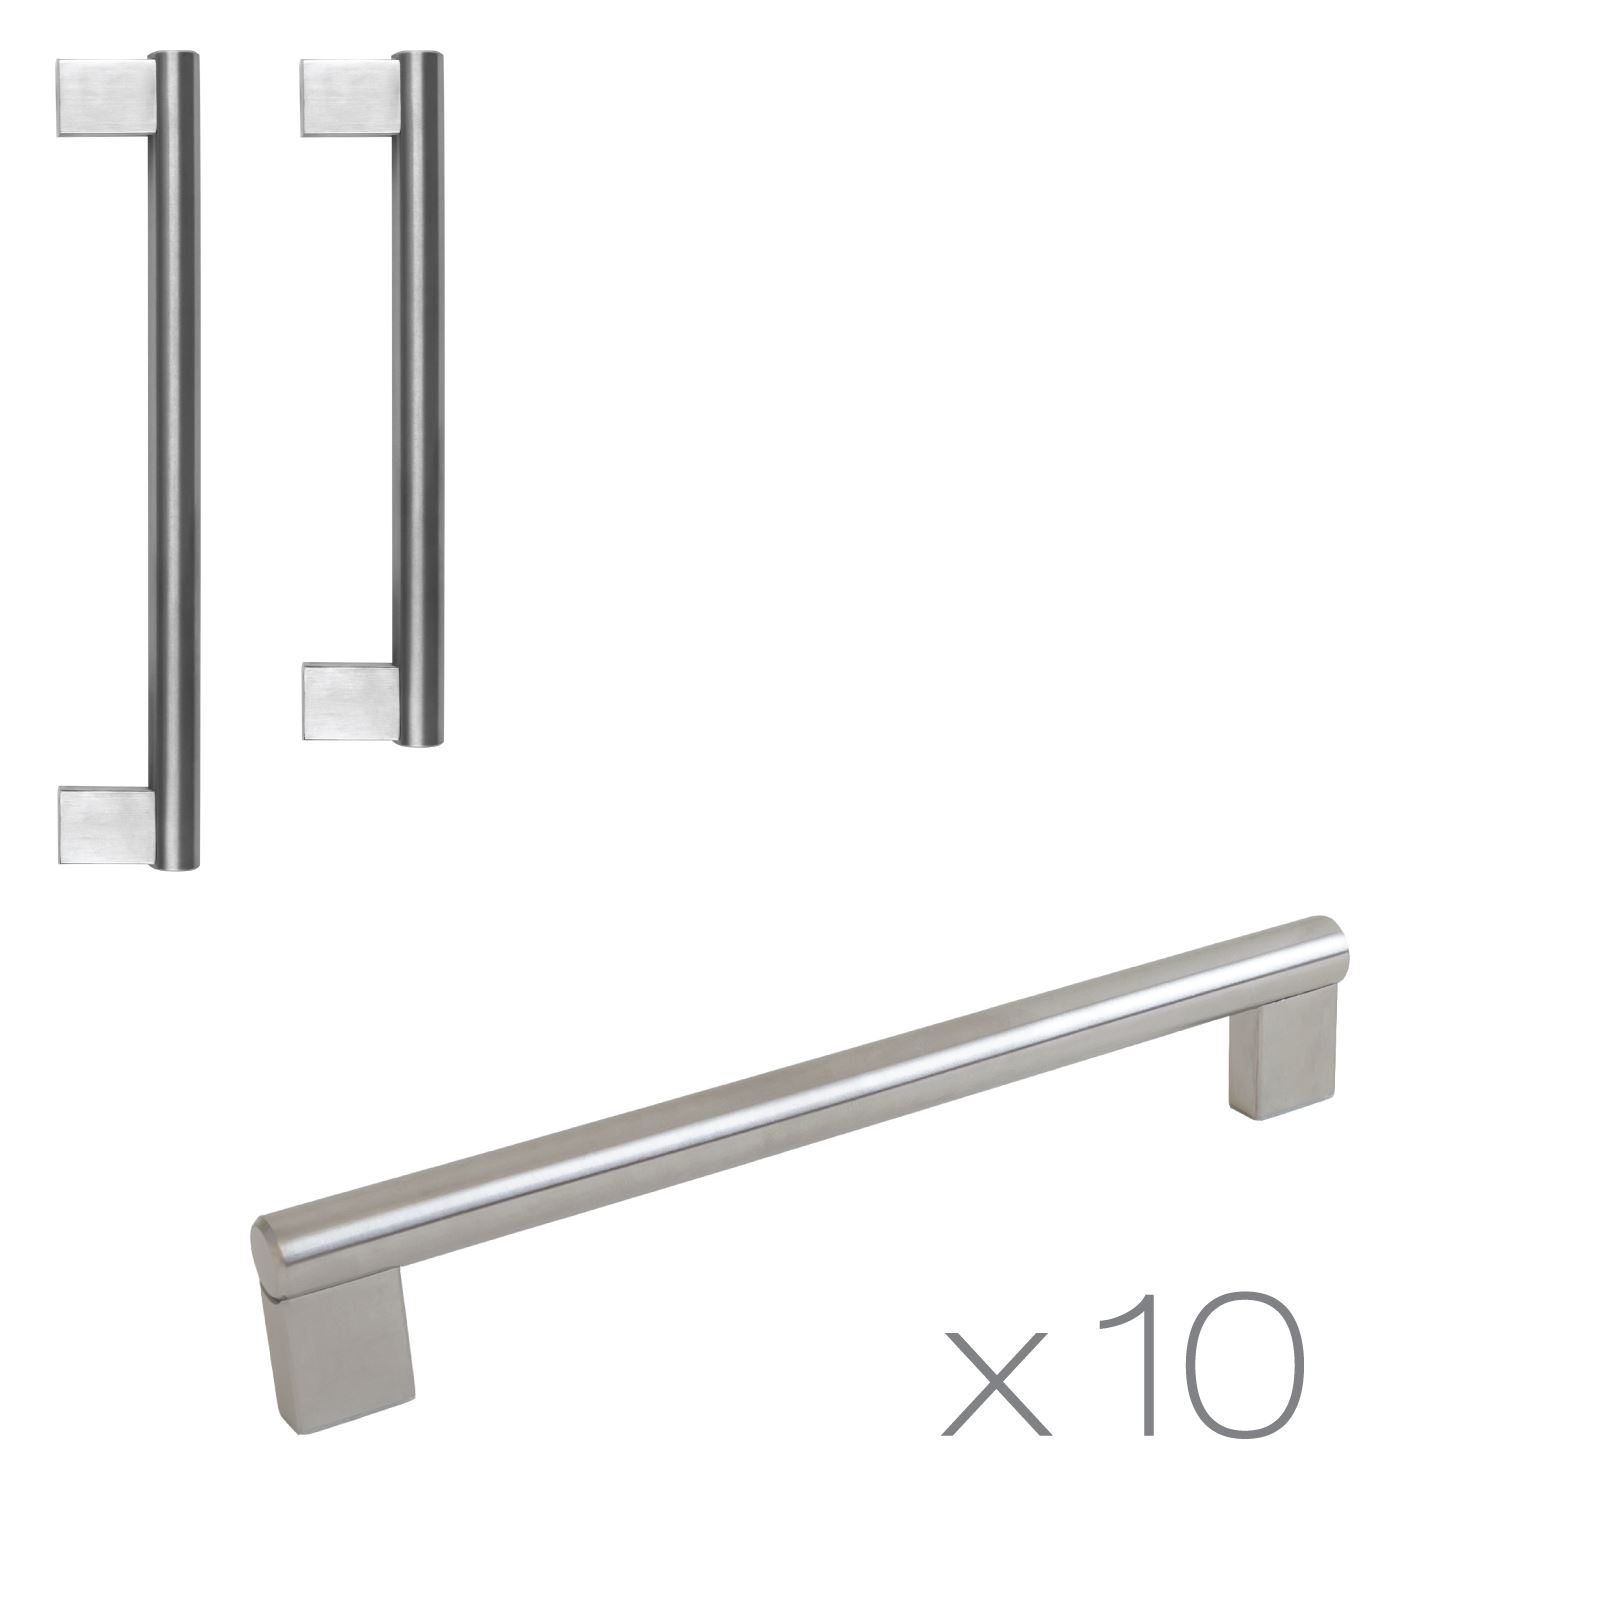 Stainless Steel Kitchen Cabinet Knobs Uk: 10 Boss Bar Stainless Steel Kitchen Cupboard Cabinet